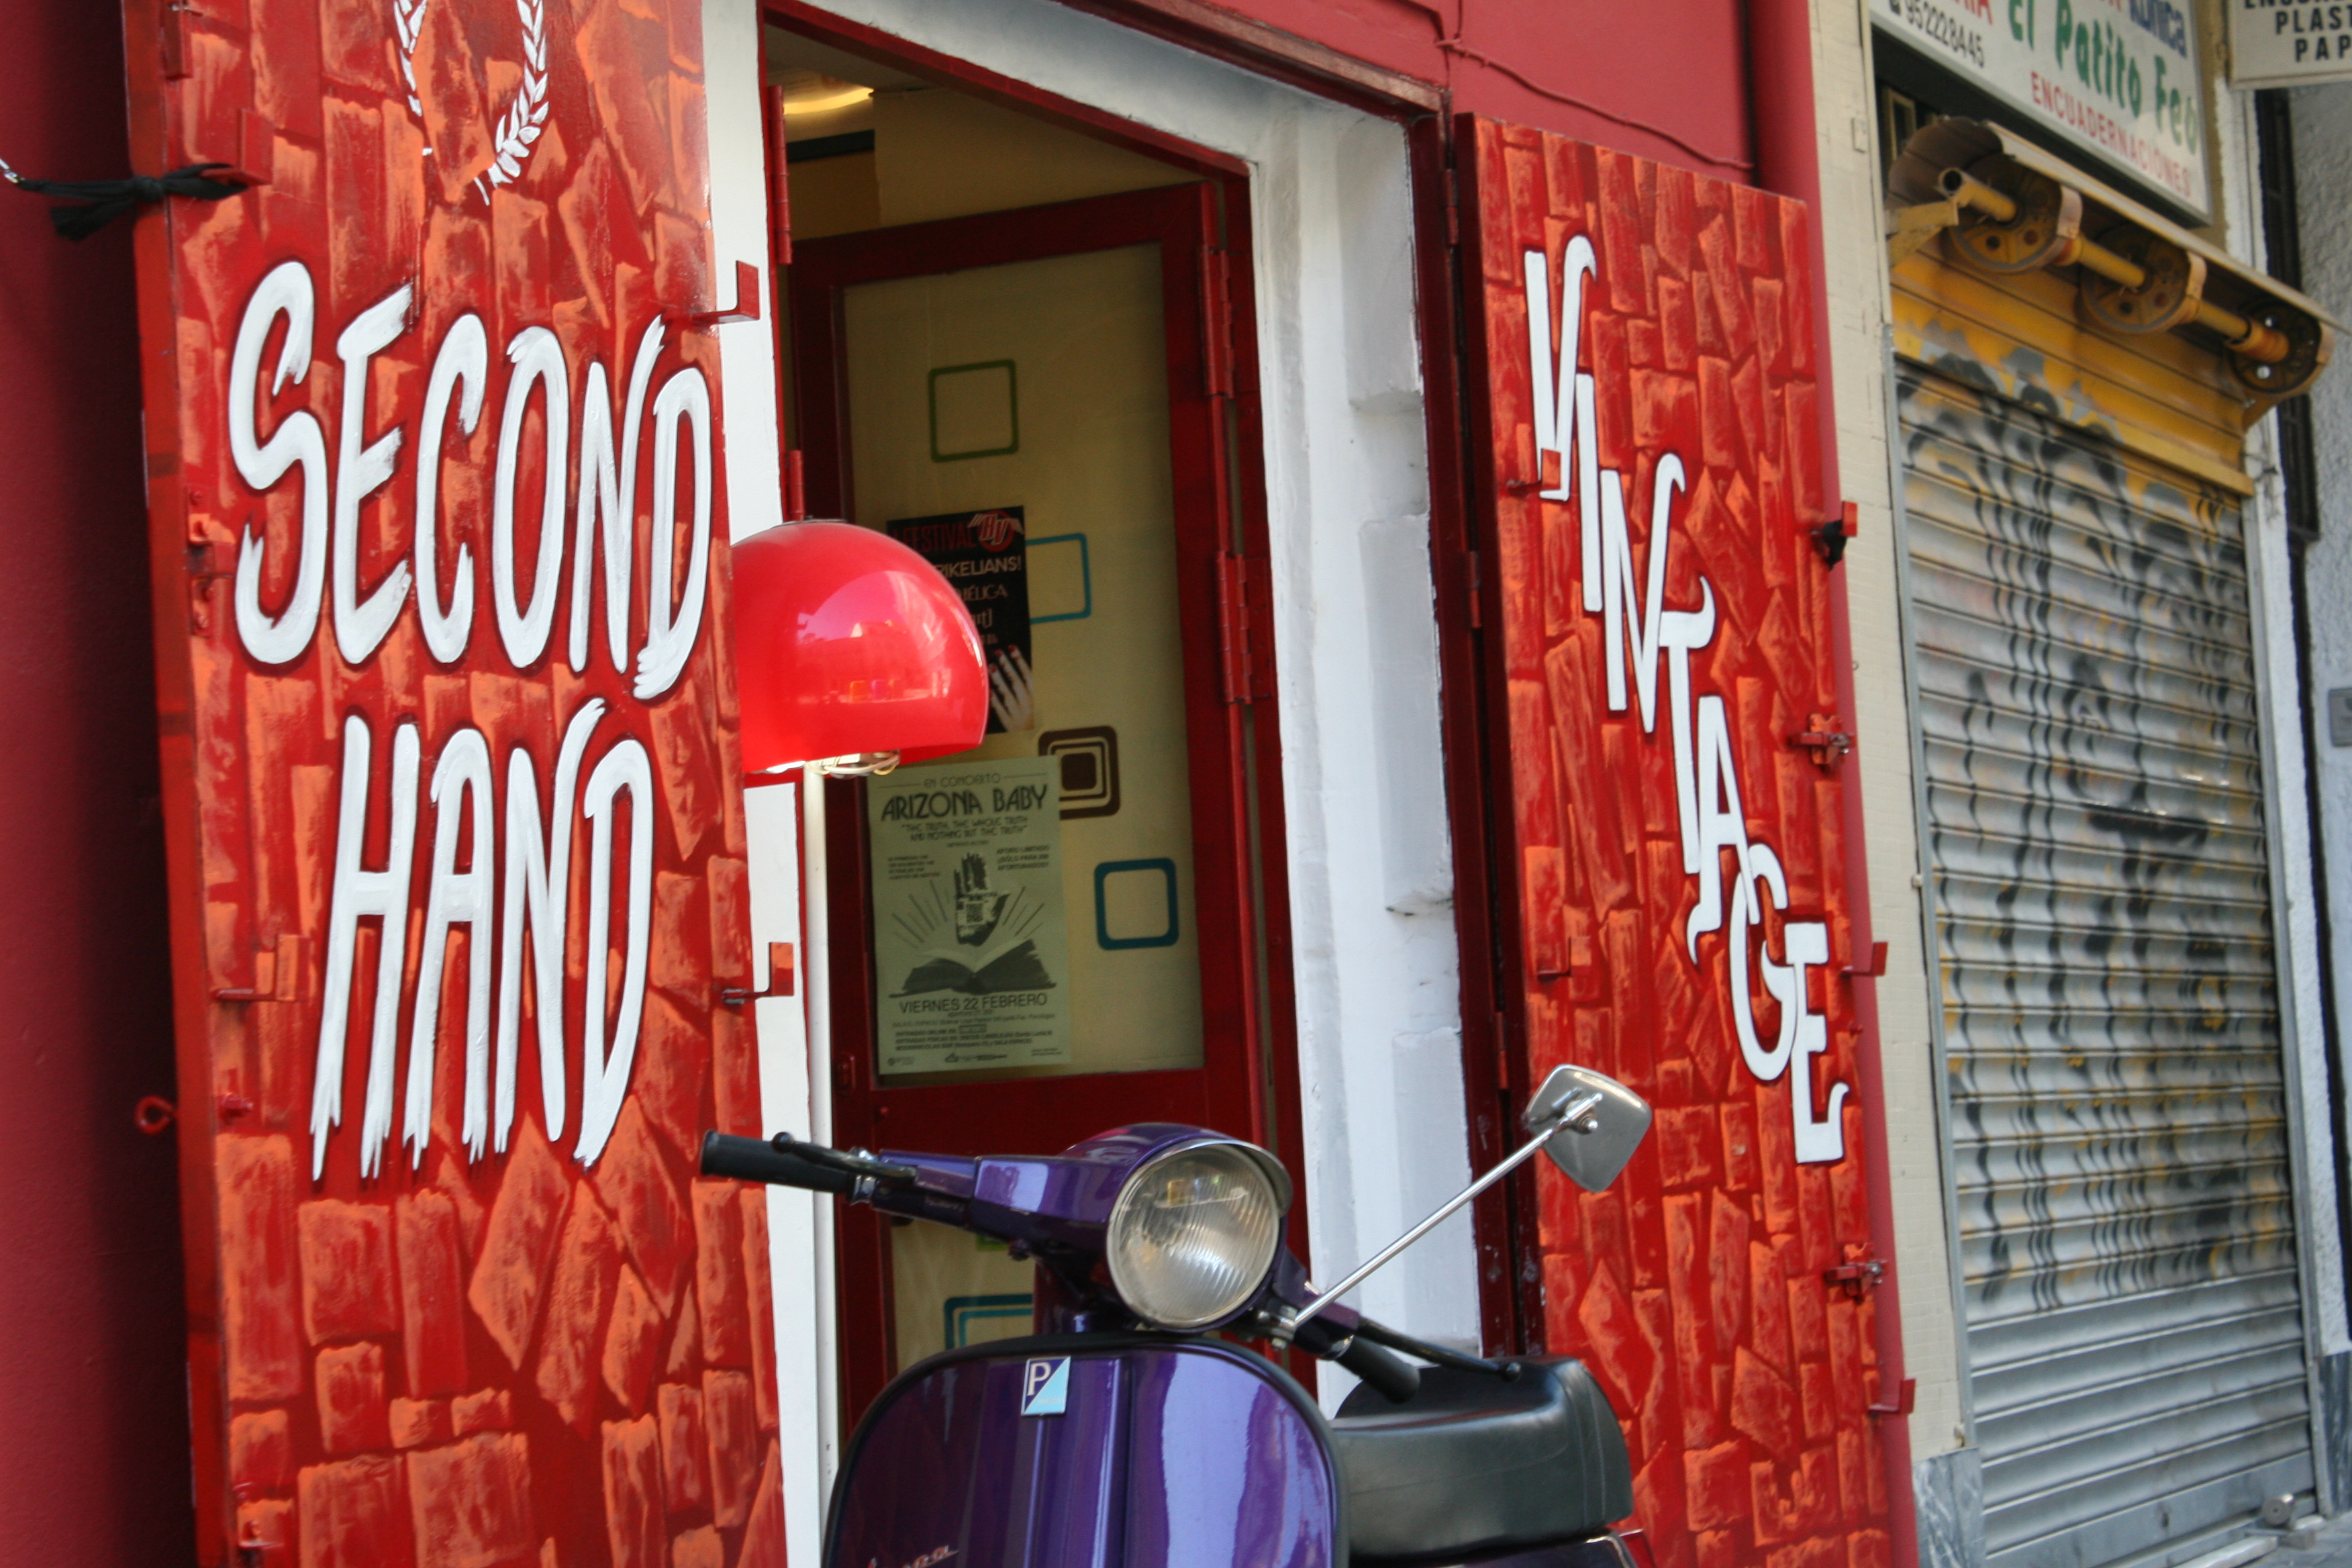 Clothing store in Spanish | English to Spanish